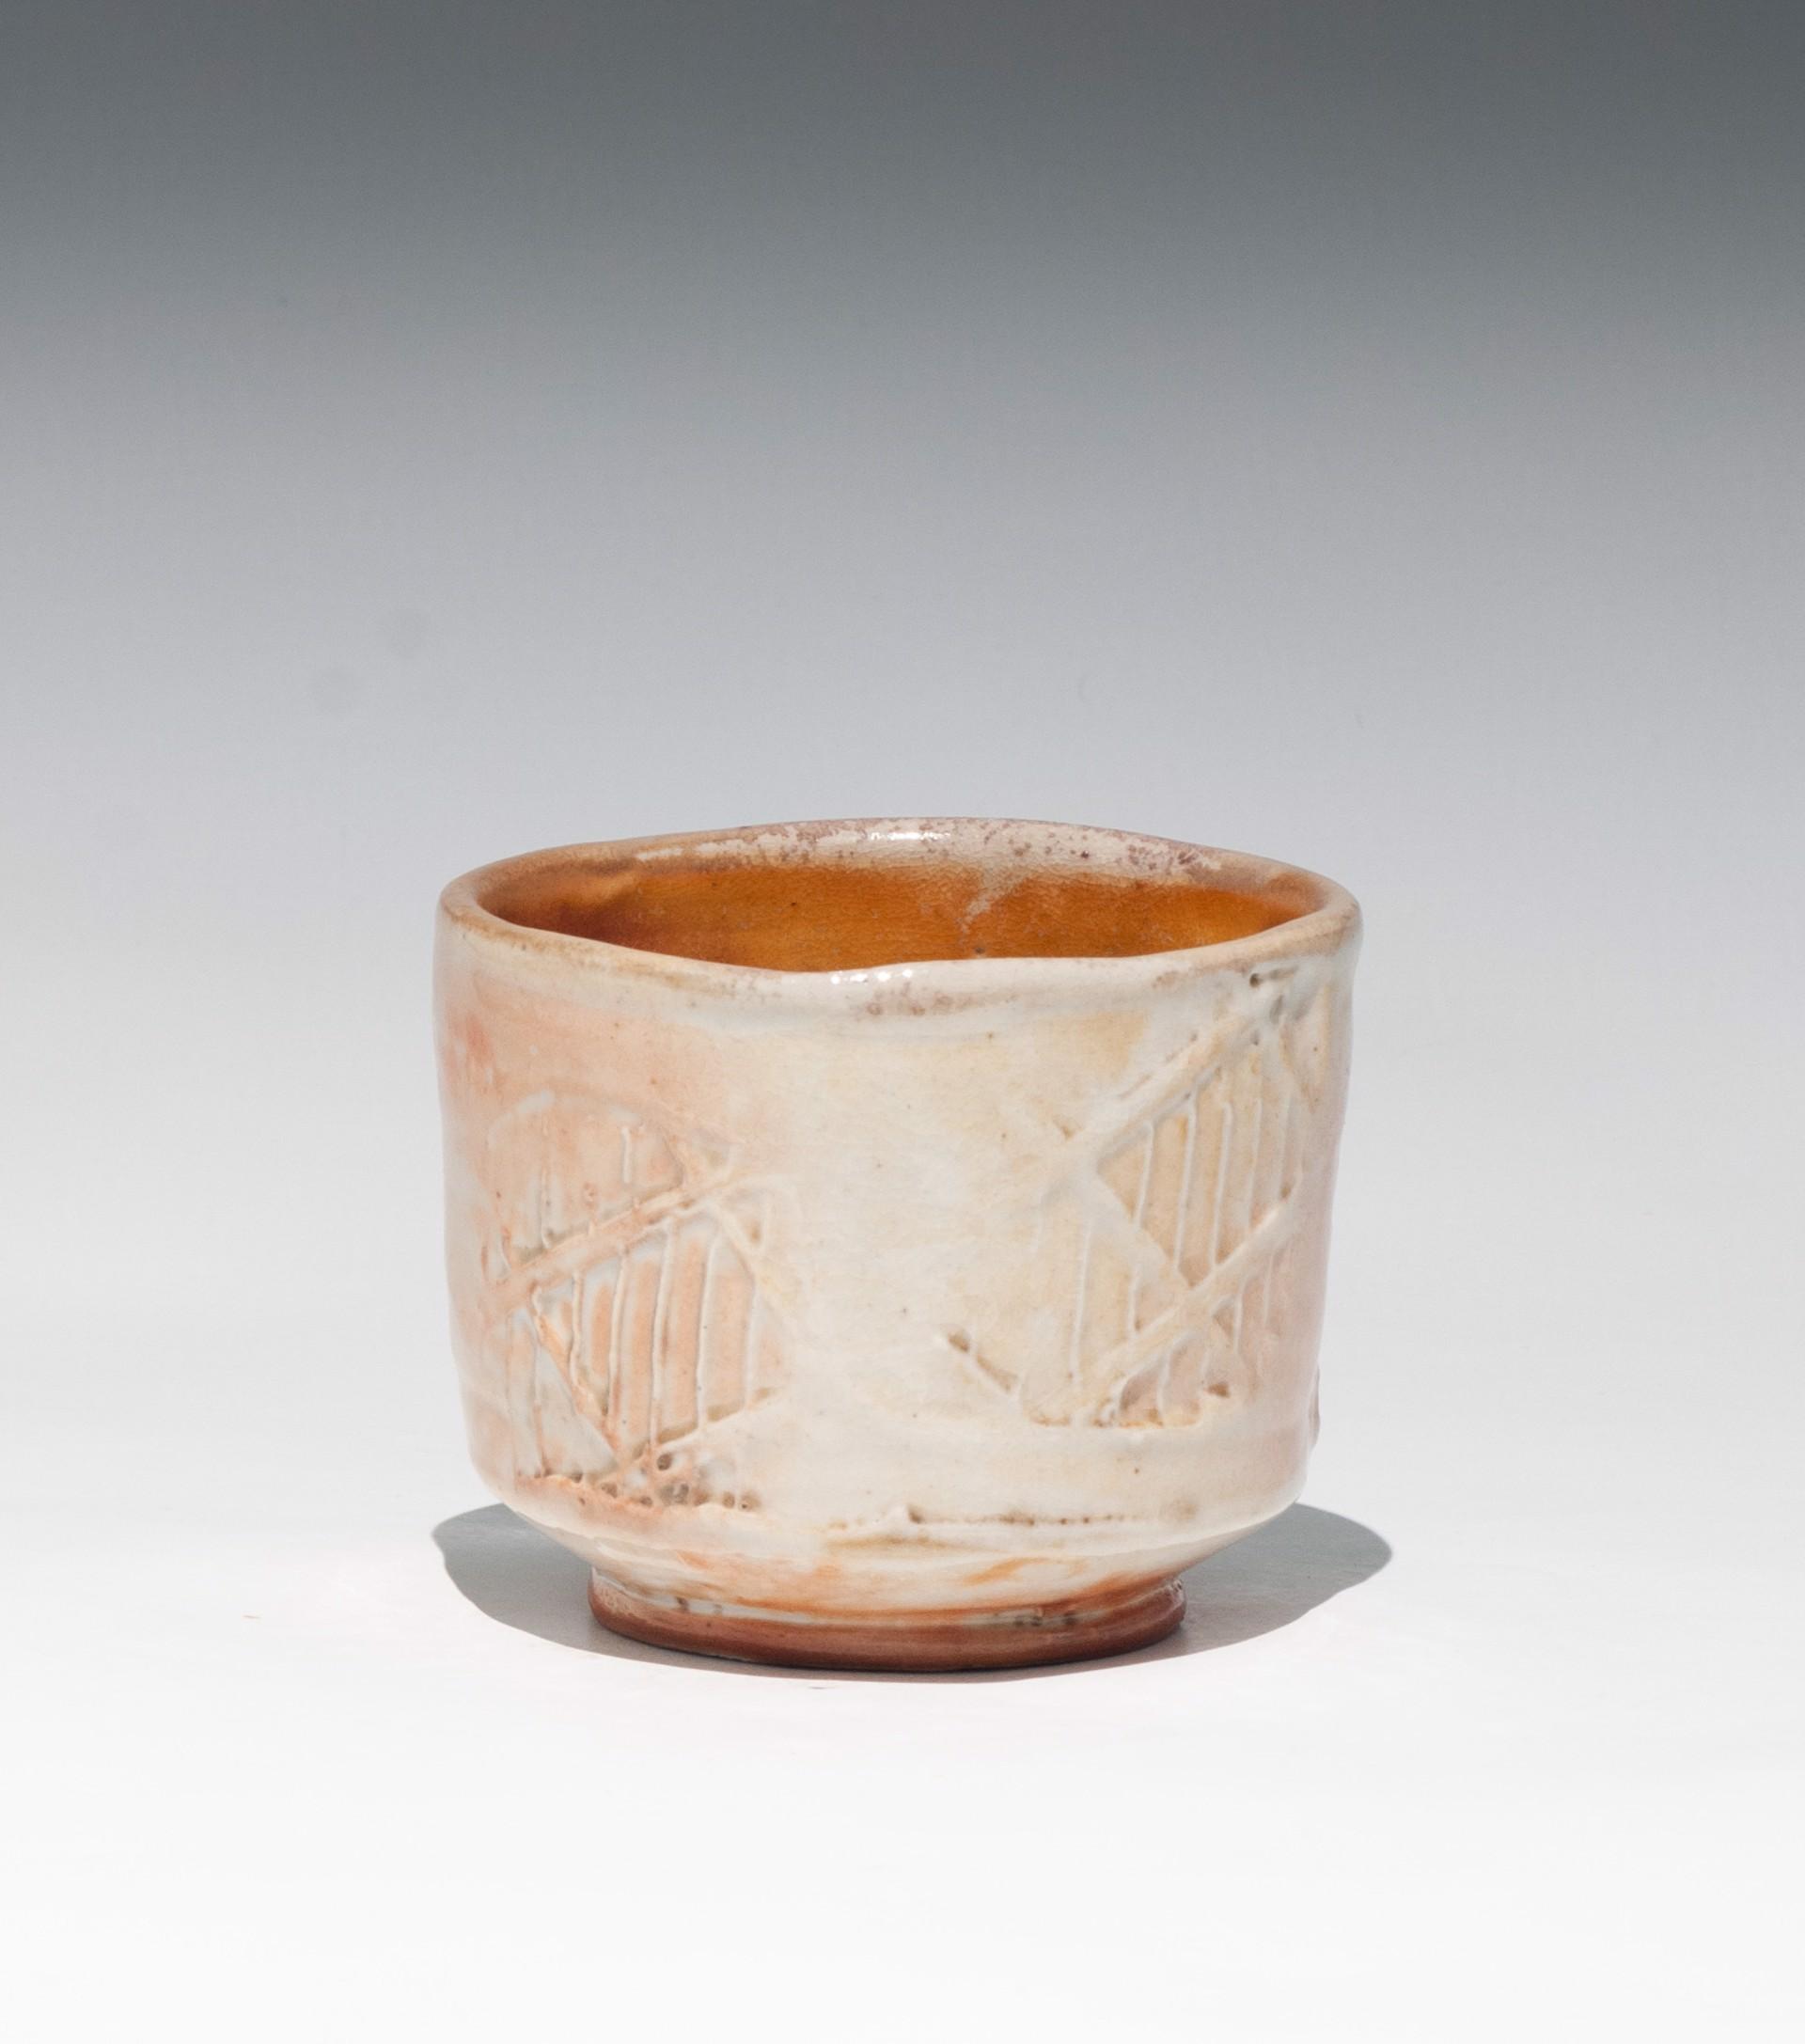 Lewis & Clark Tea Bowl by Daniel Anderson